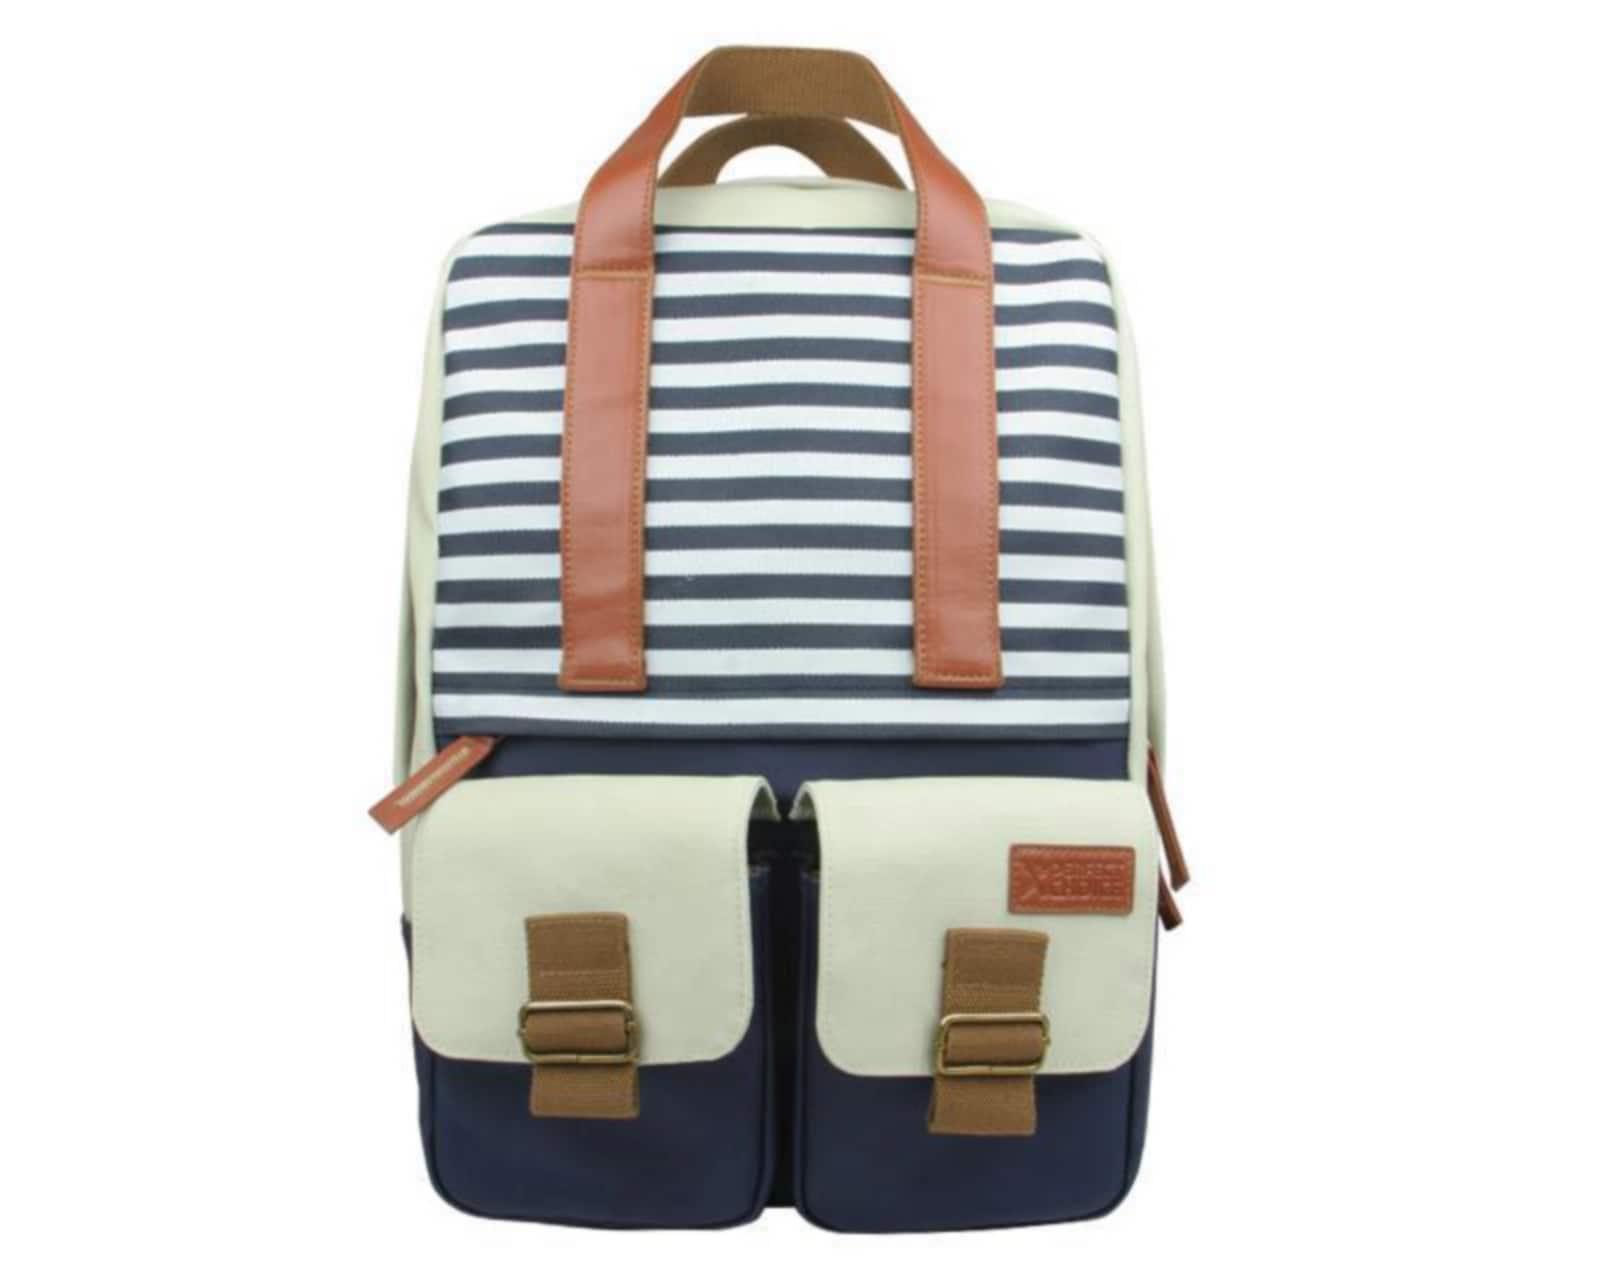 Foto 1|Backpack para Laptop Perfect Choice de 14